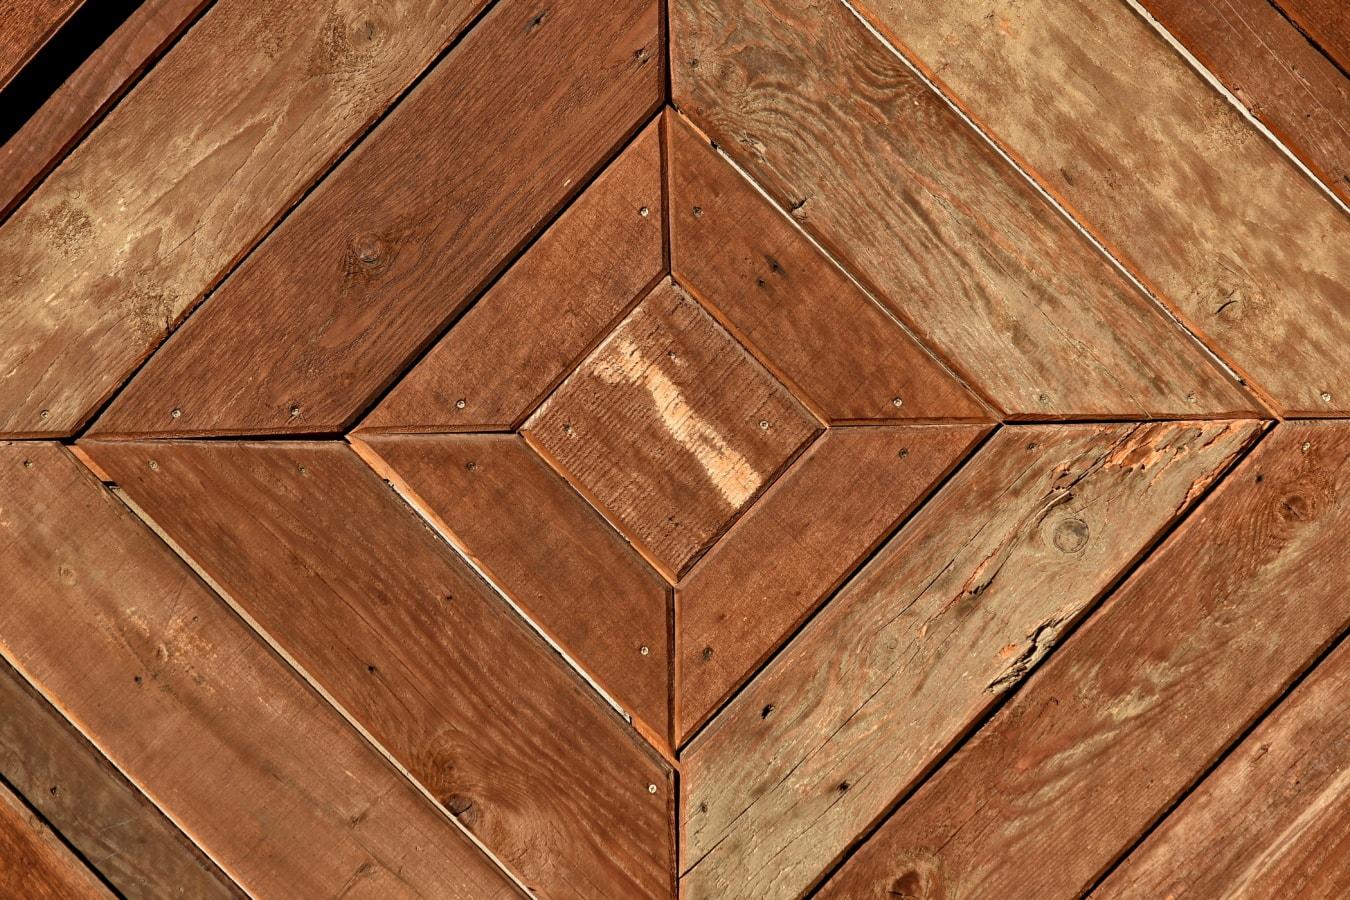 Design, Textur, Rechteck, aus Holz, Holz, Braun, Hartholz, Planken, Material, Retro